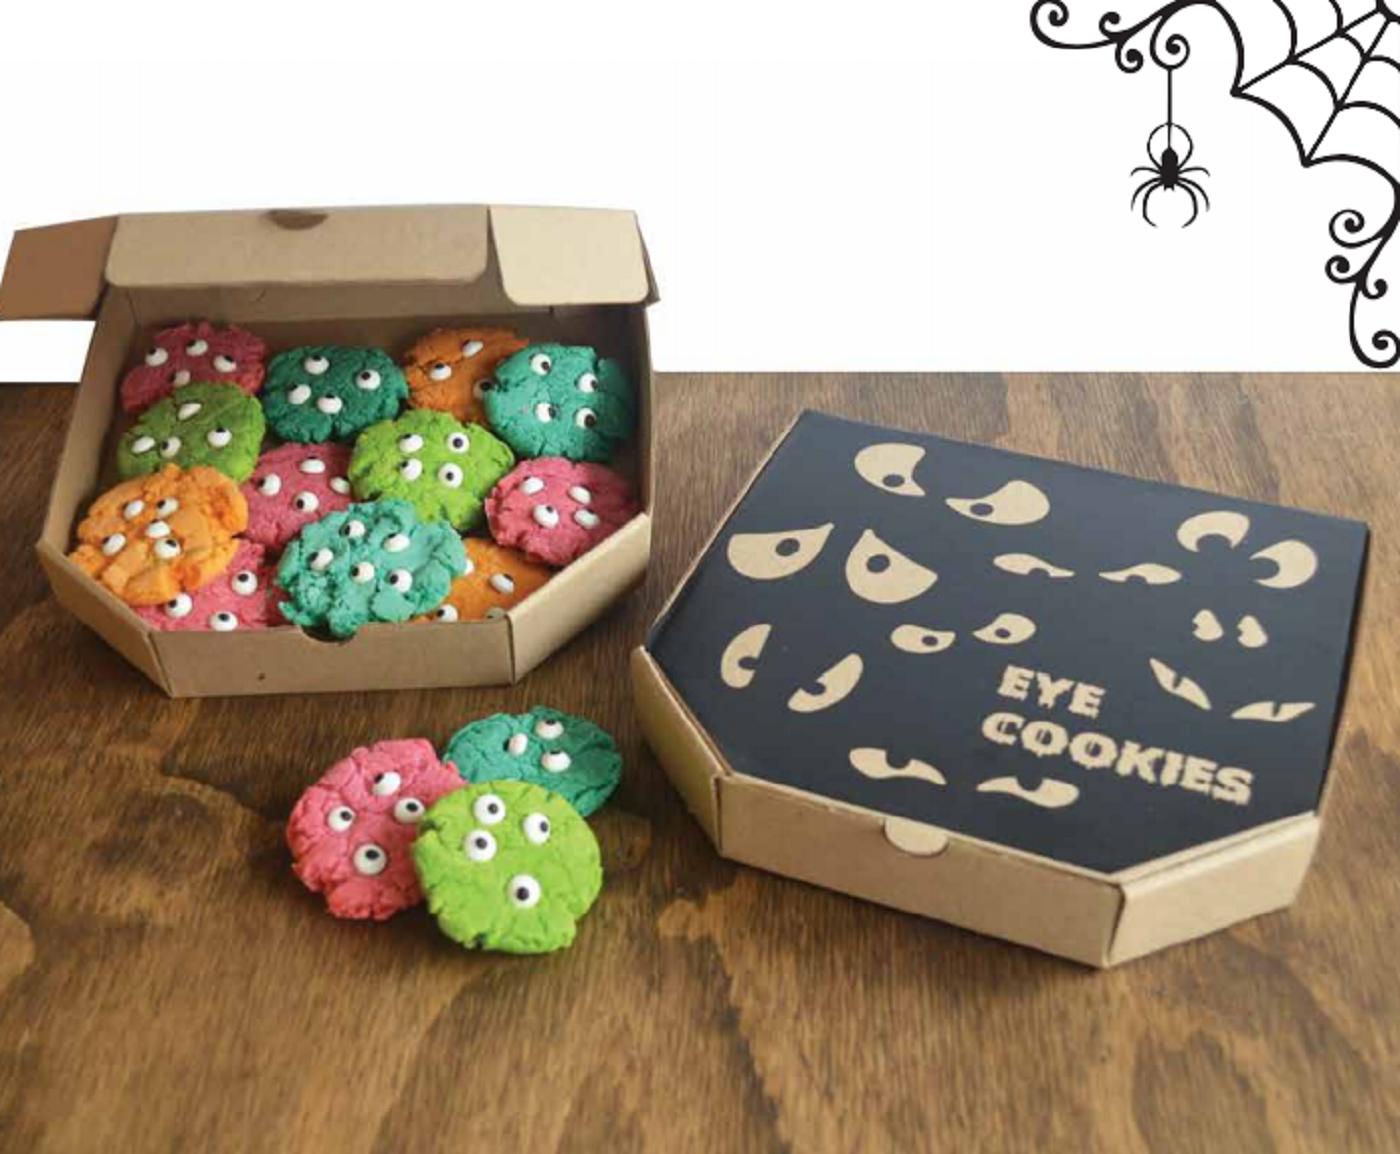 Eye cookies - Happy Halloween